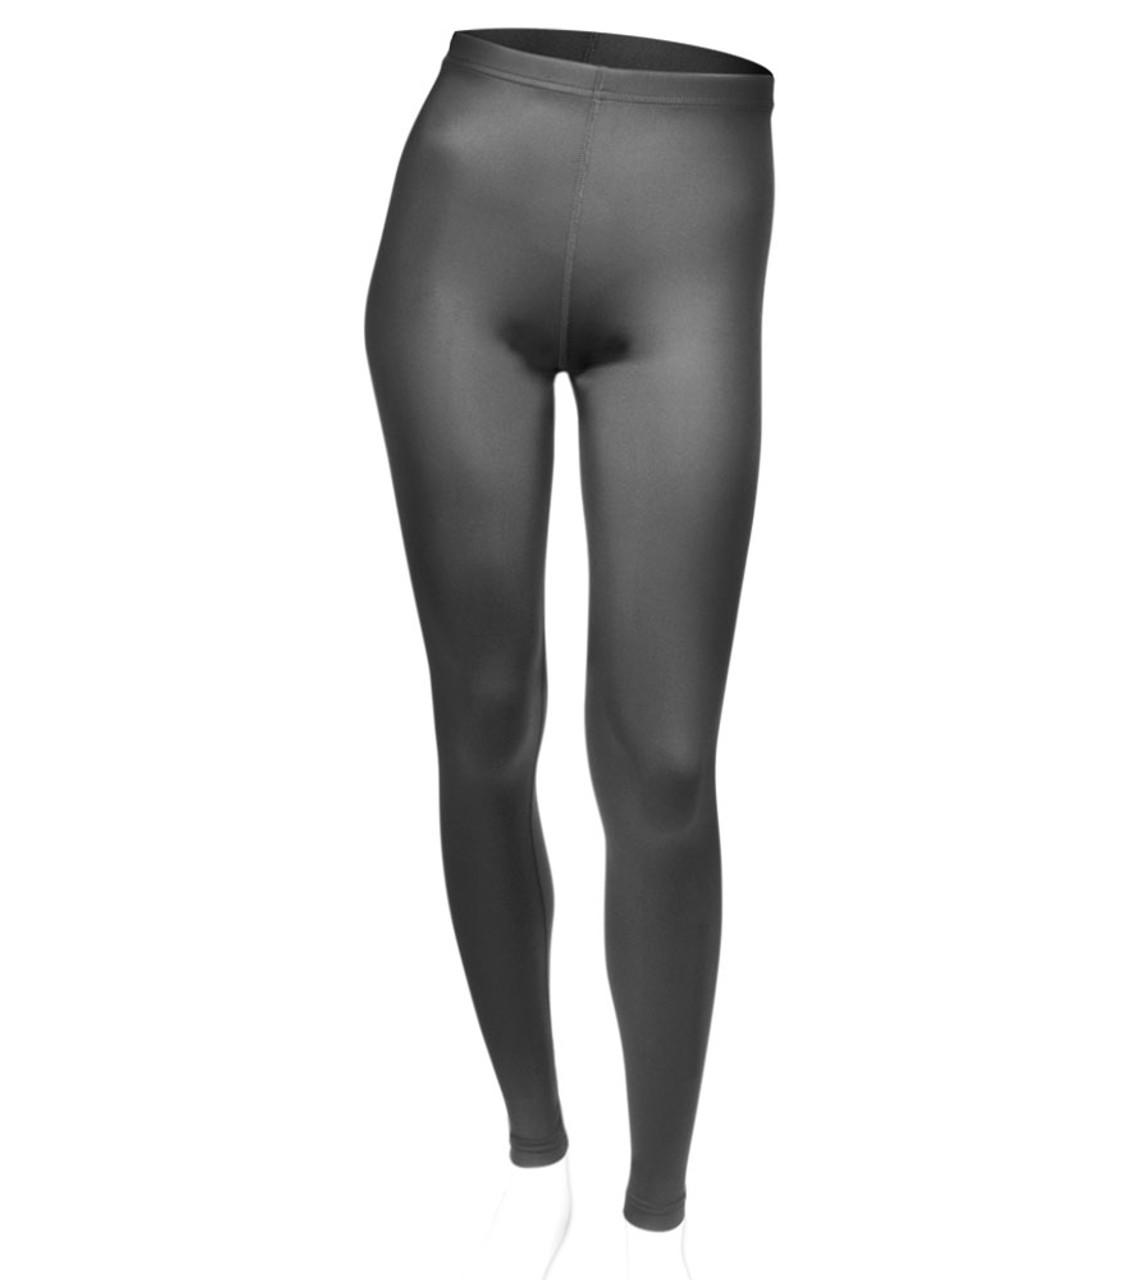 7ecbe38b2e Plus Size Women's Spandex Workout Pants Compression Tights